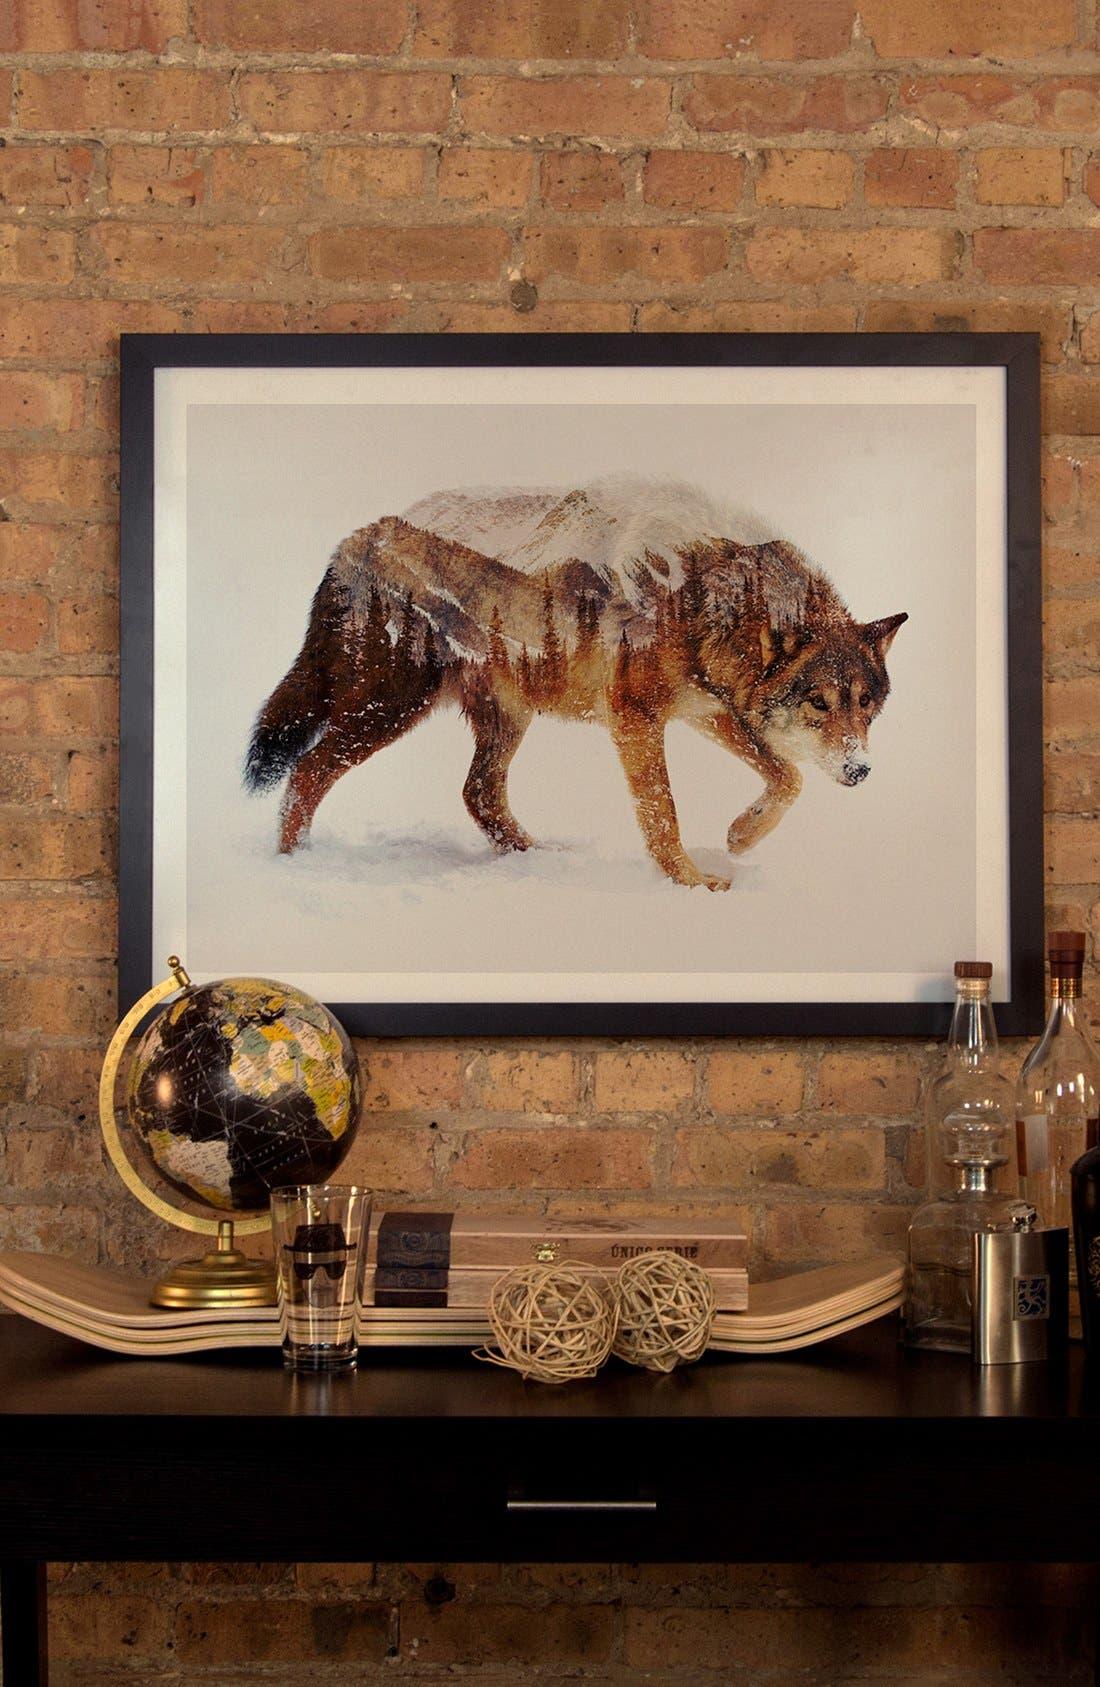 'Arctic Wolf' Framed Fine Art Print,                             Alternate thumbnail 2, color,                             BROWN